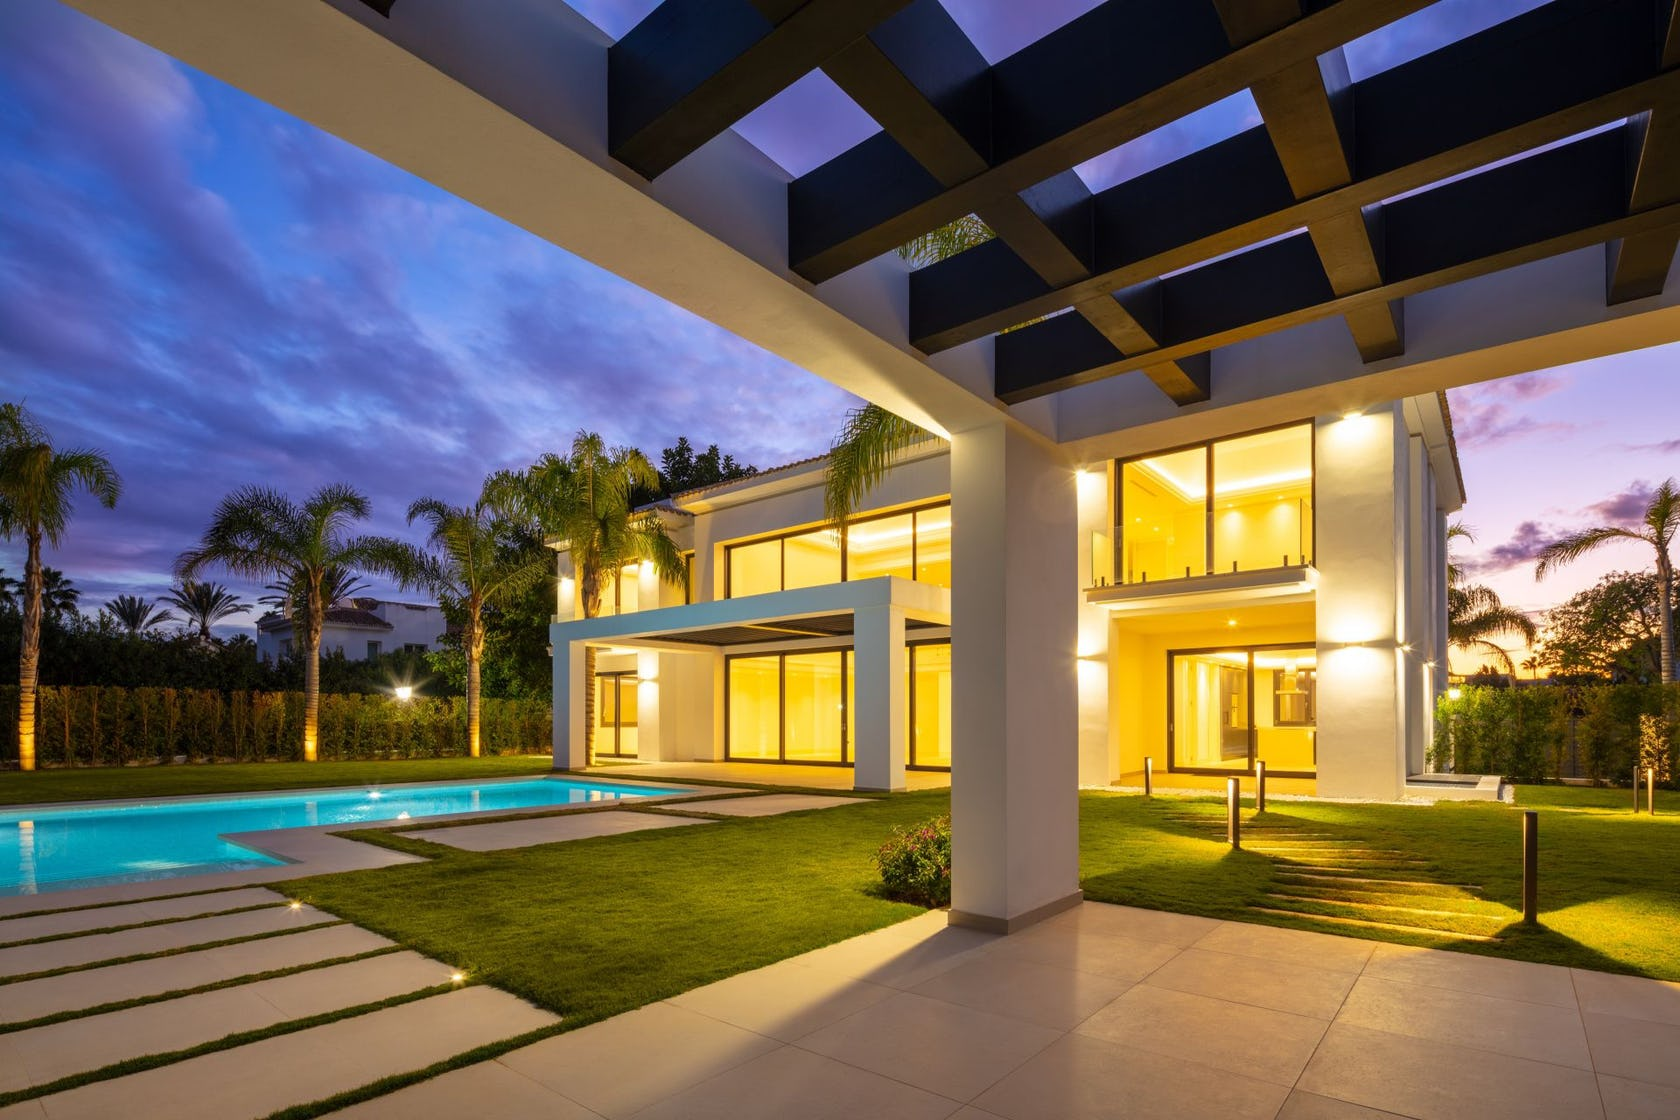 villa building housing house patio hotel